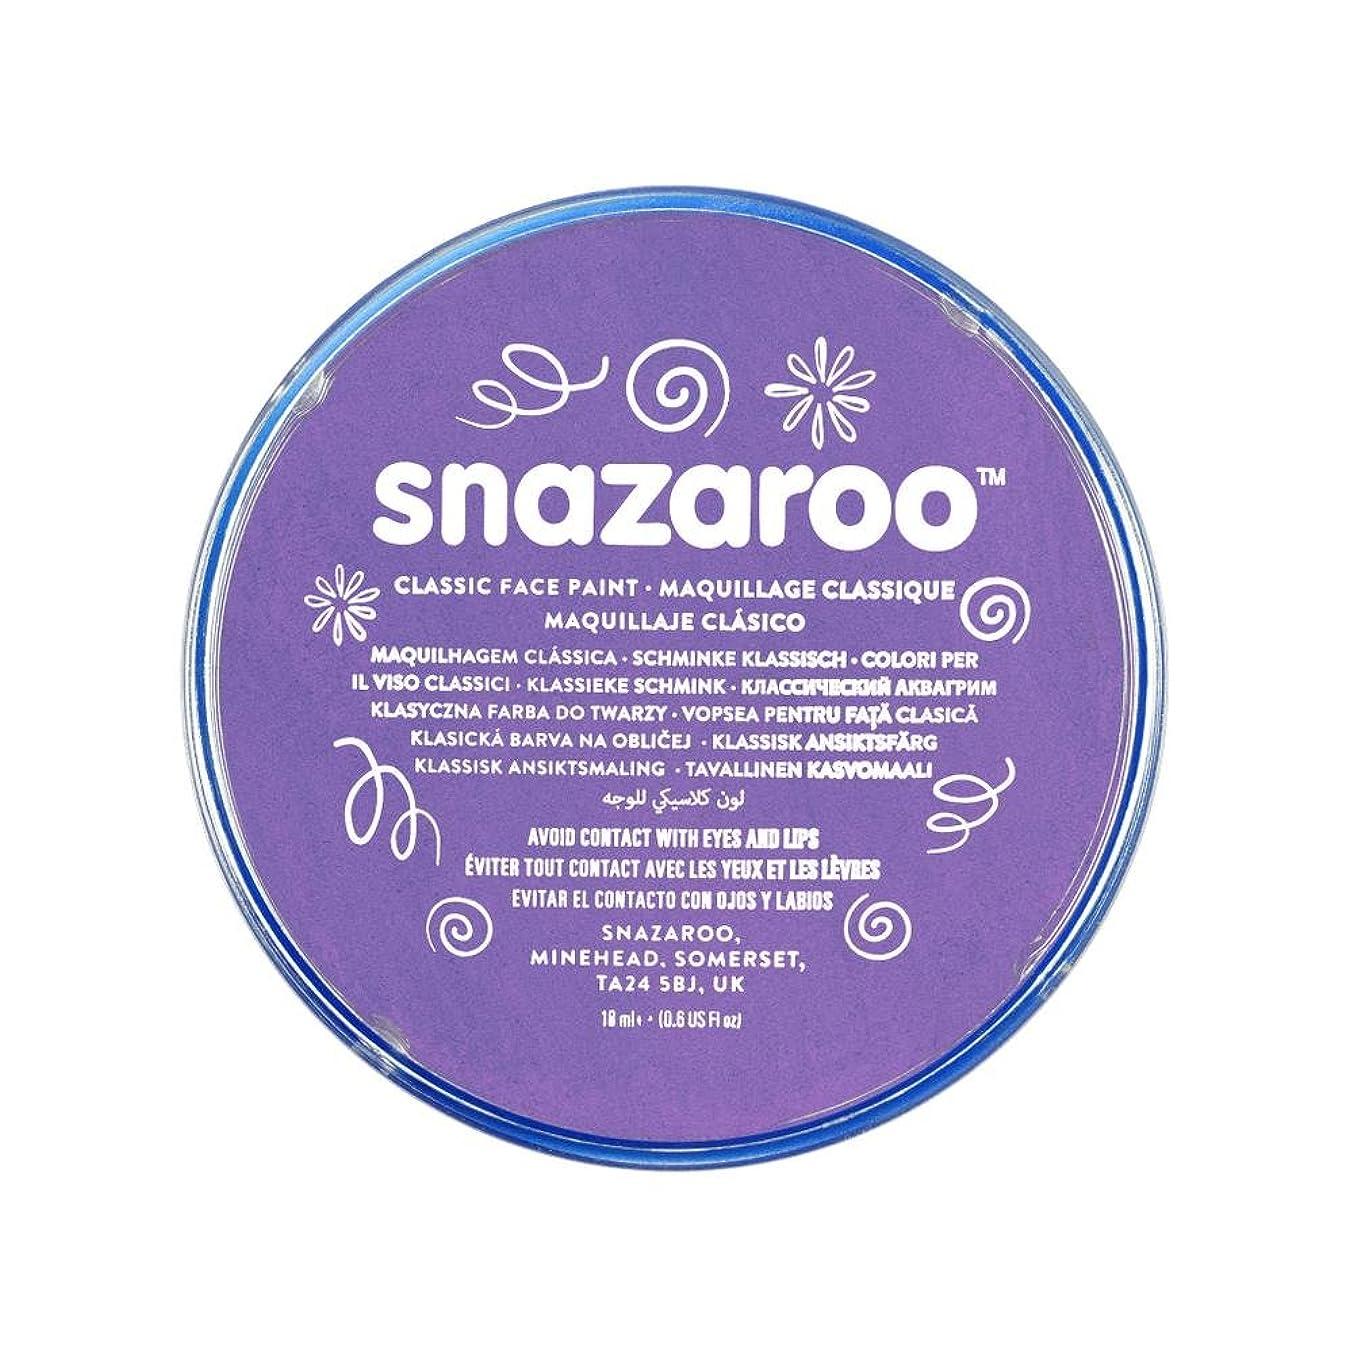 Snazaroo Classic Face Paint, 18ml, Lilac